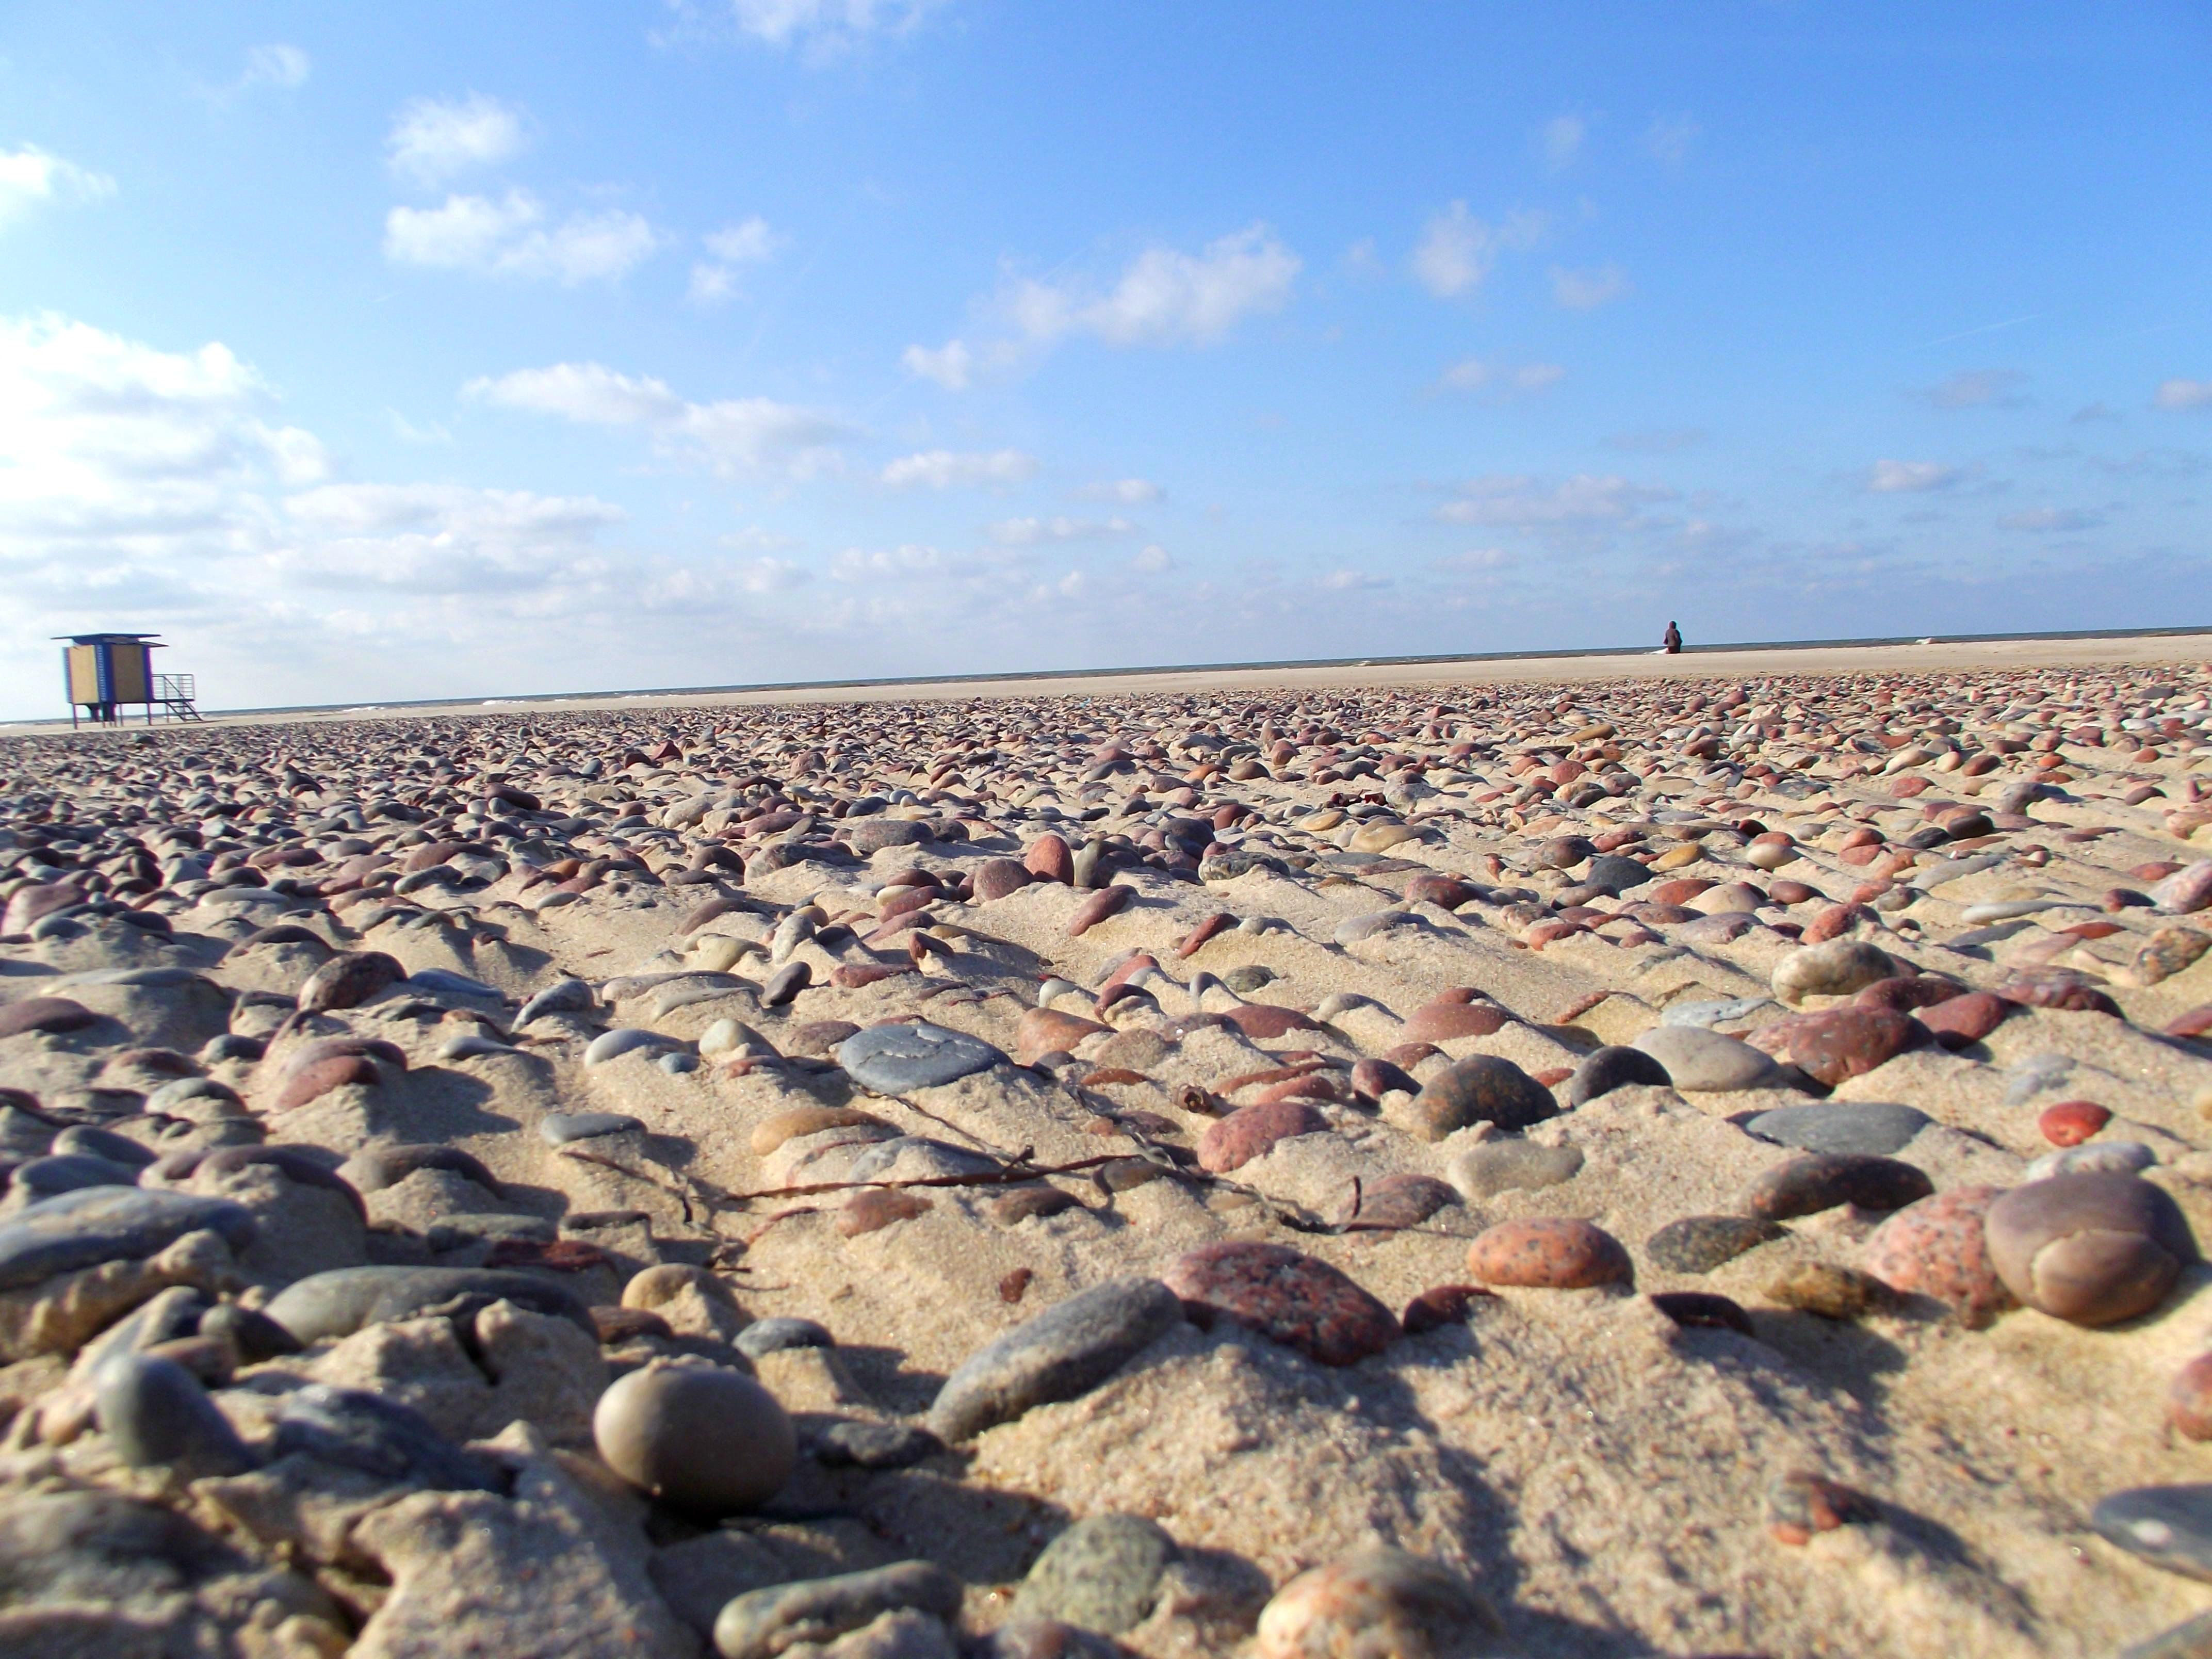 Rocky beach, Beach, House, Landscape, Lifeguard, HQ Photo